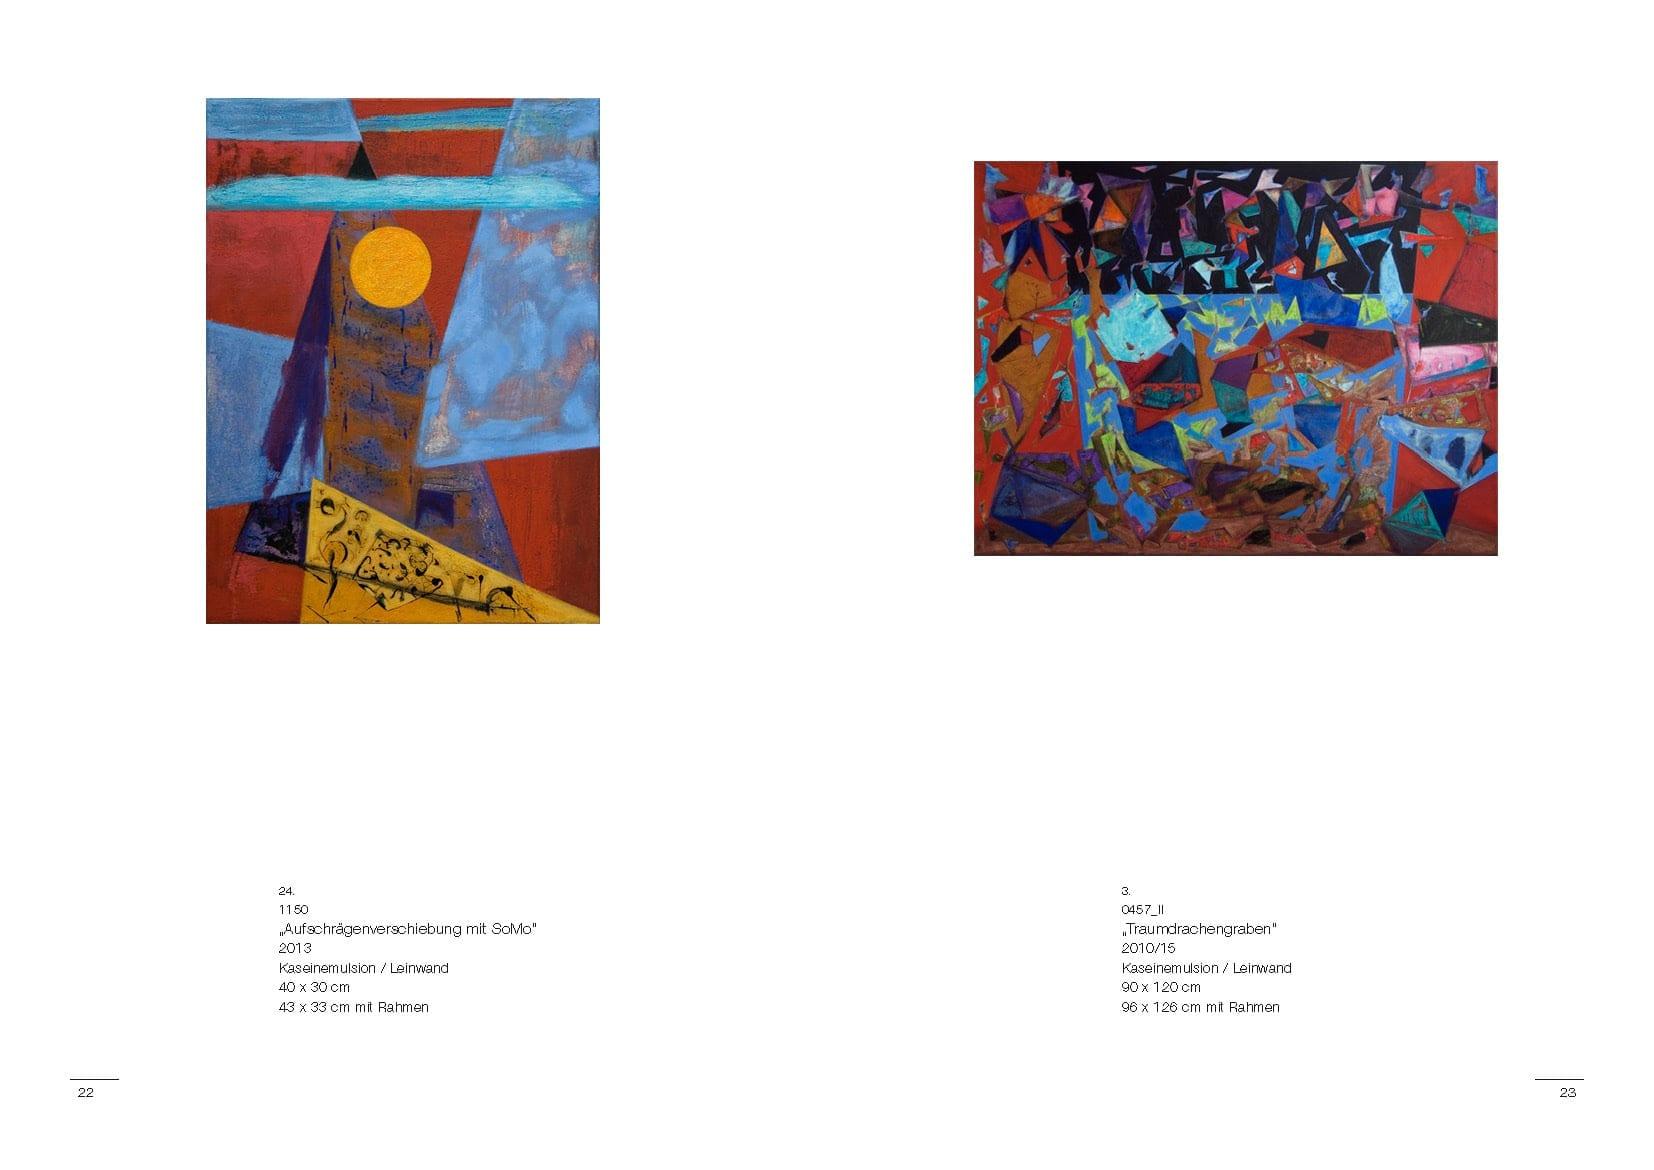 JOST GIESE Ausst. KH KB 2016 Katalog_A4_2 Doppelseiten_Seite_12 ...